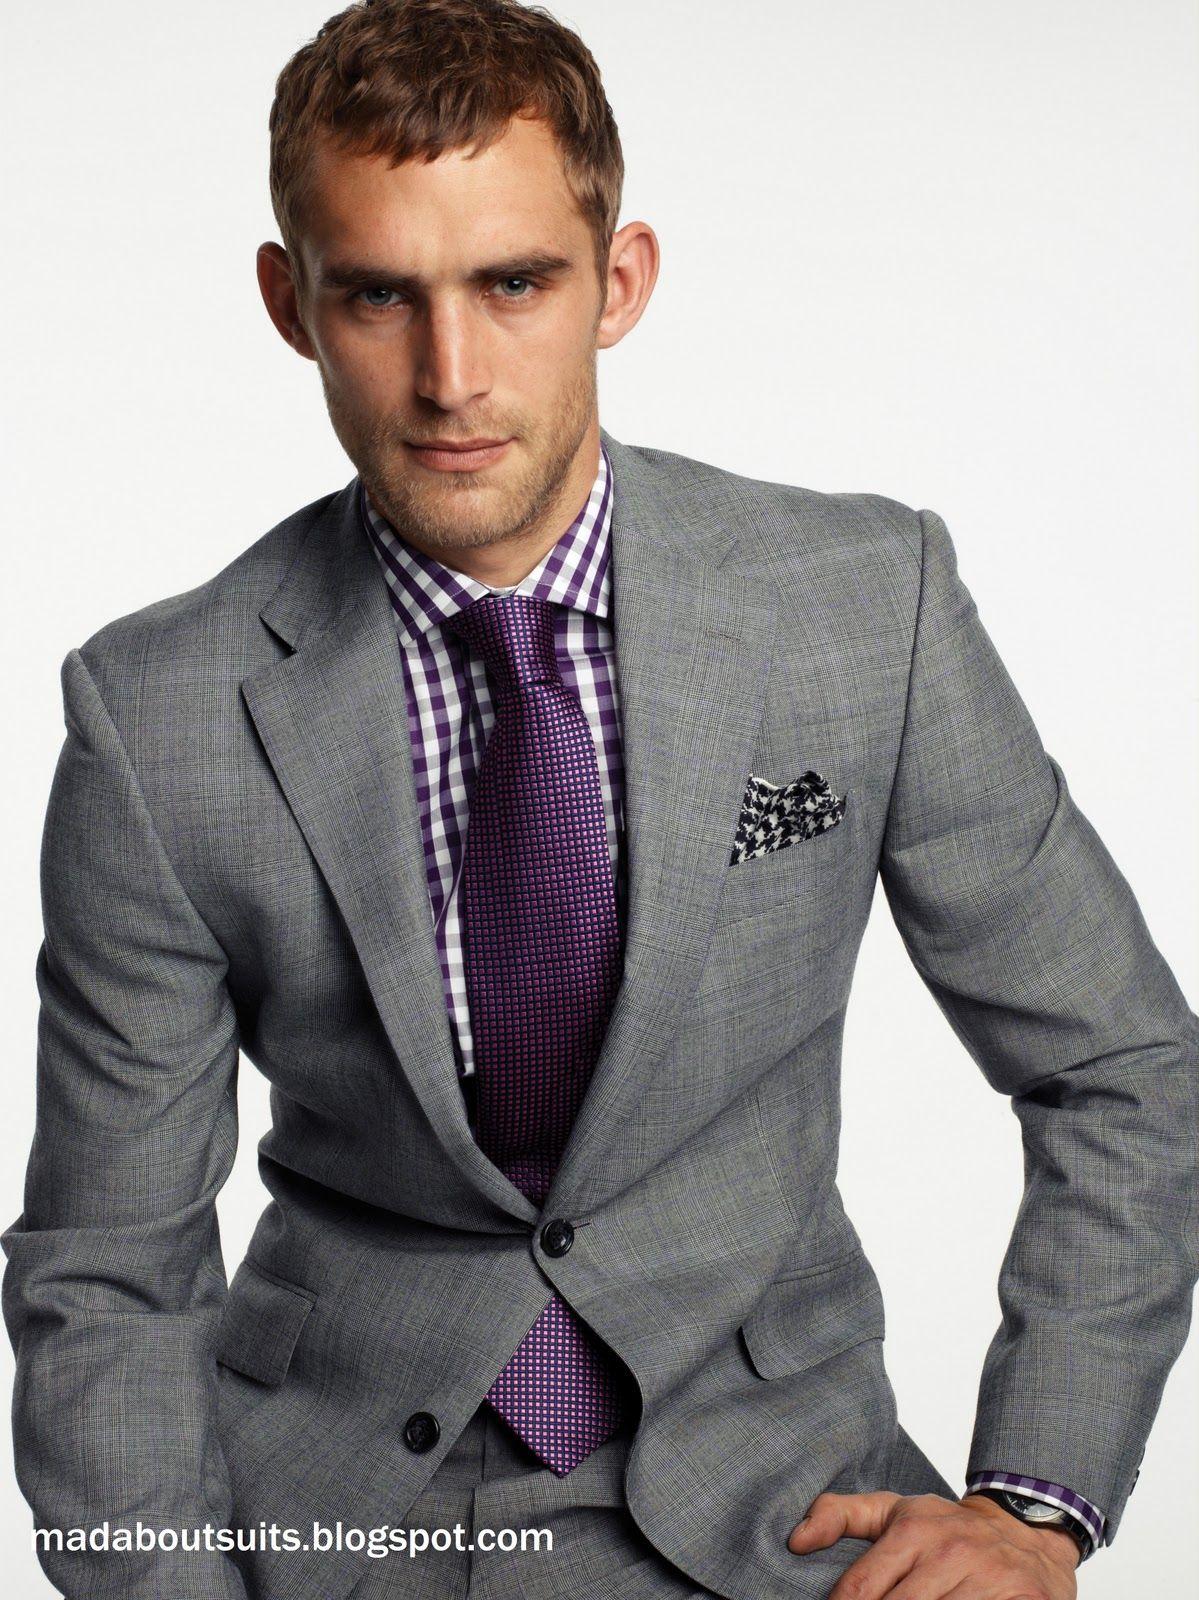 Grey tux, purple tie | Danielle's Wedding | Pinterest ...